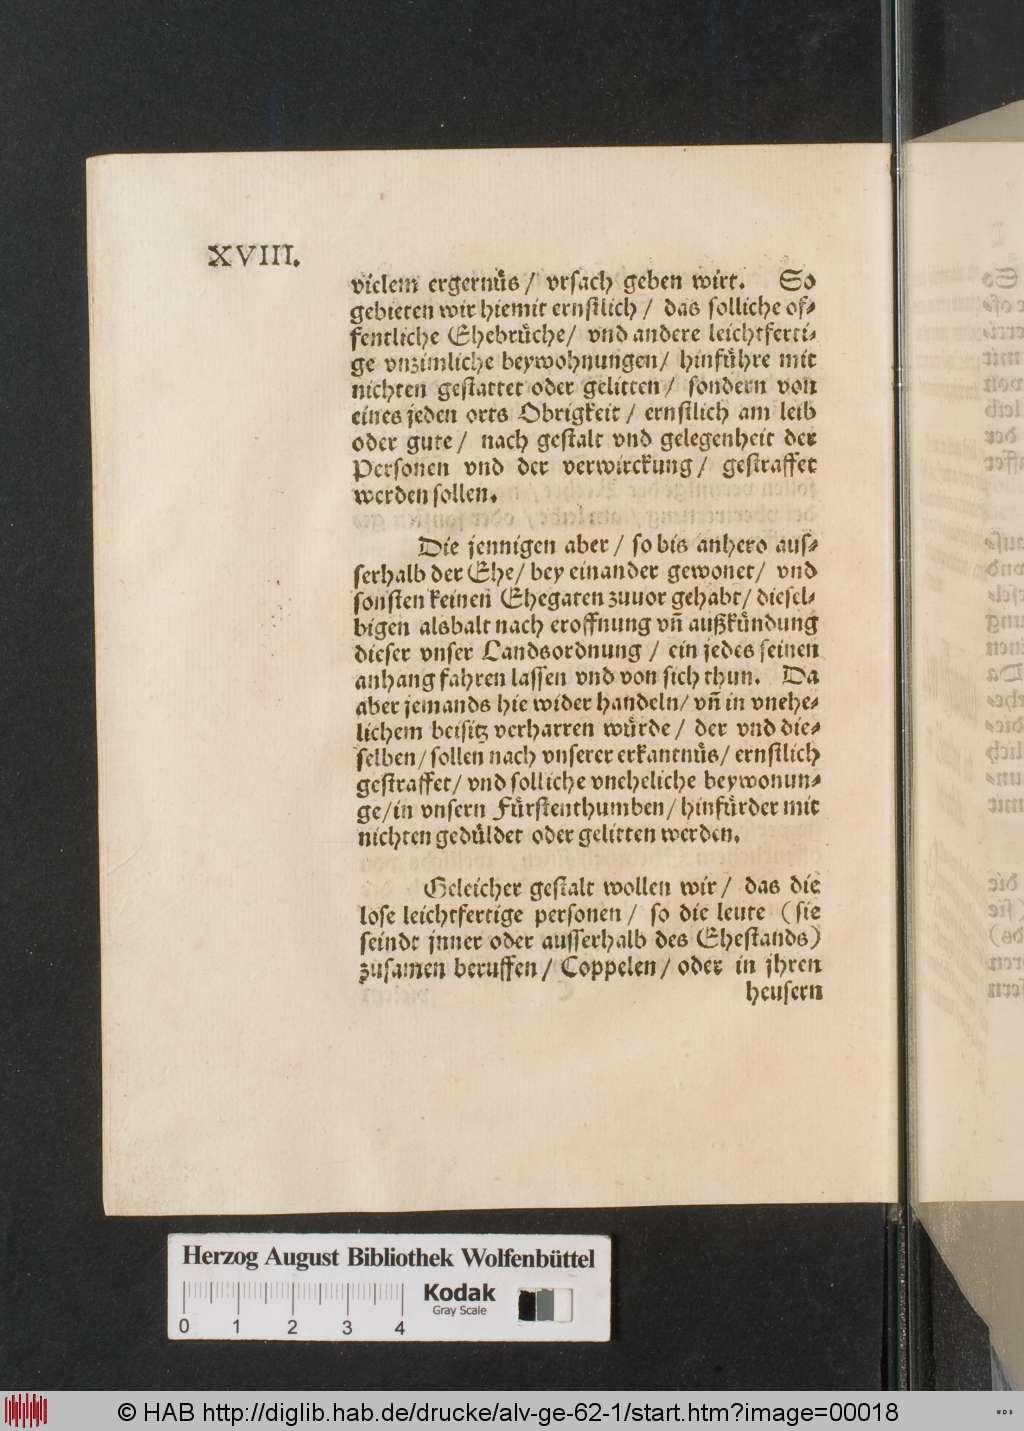 http://diglib.hab.de/drucke/alv-ge-62-1/00018.jpg